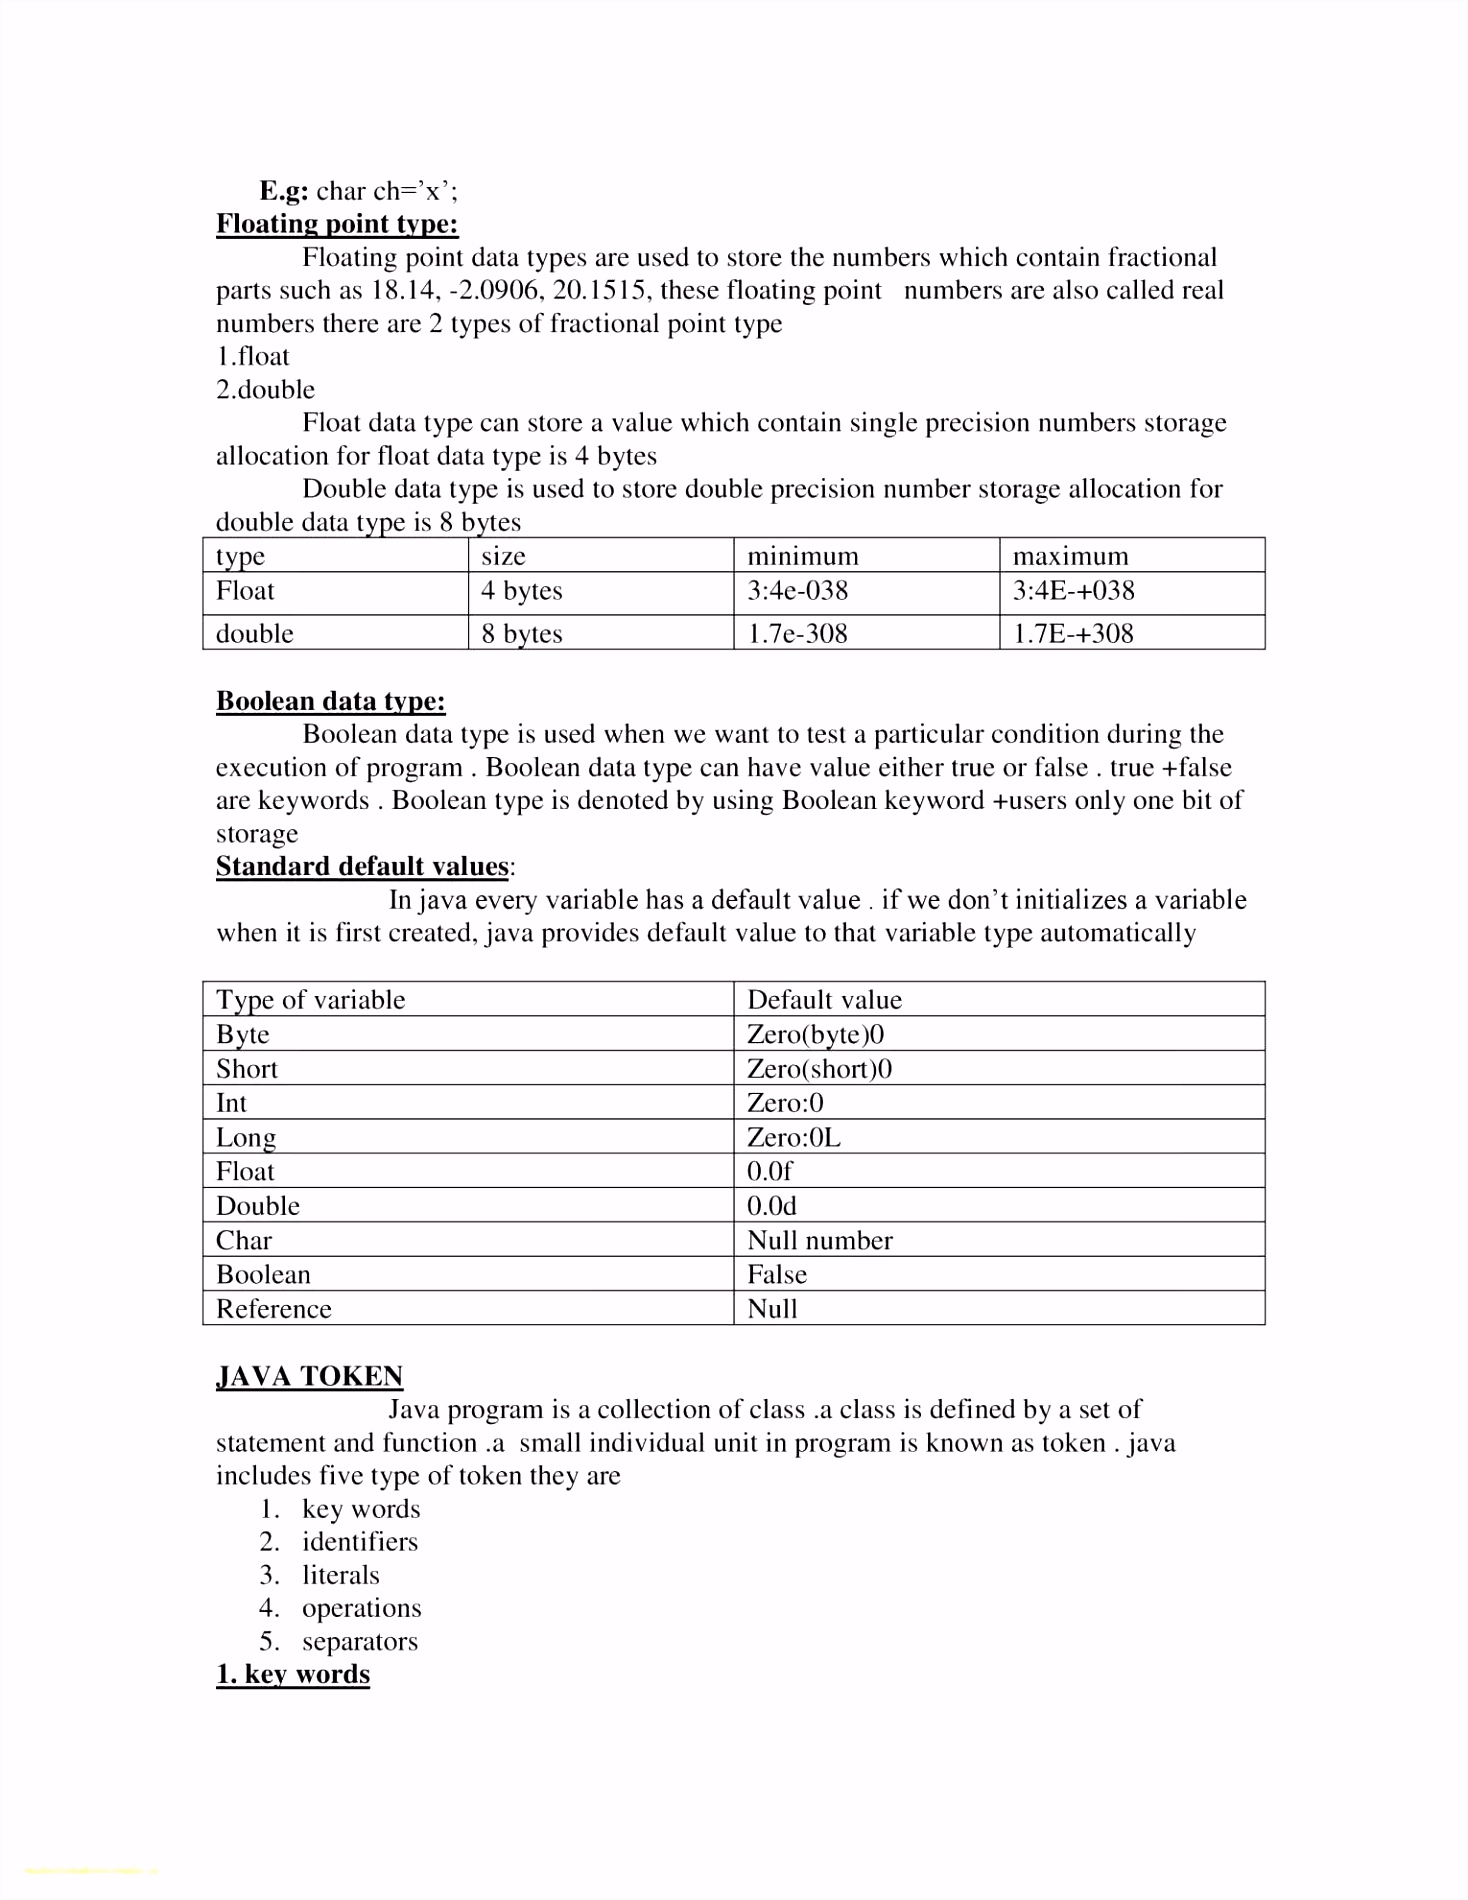 Project Schedule Gantt Chart Excel Template Heritage Spreadsheet